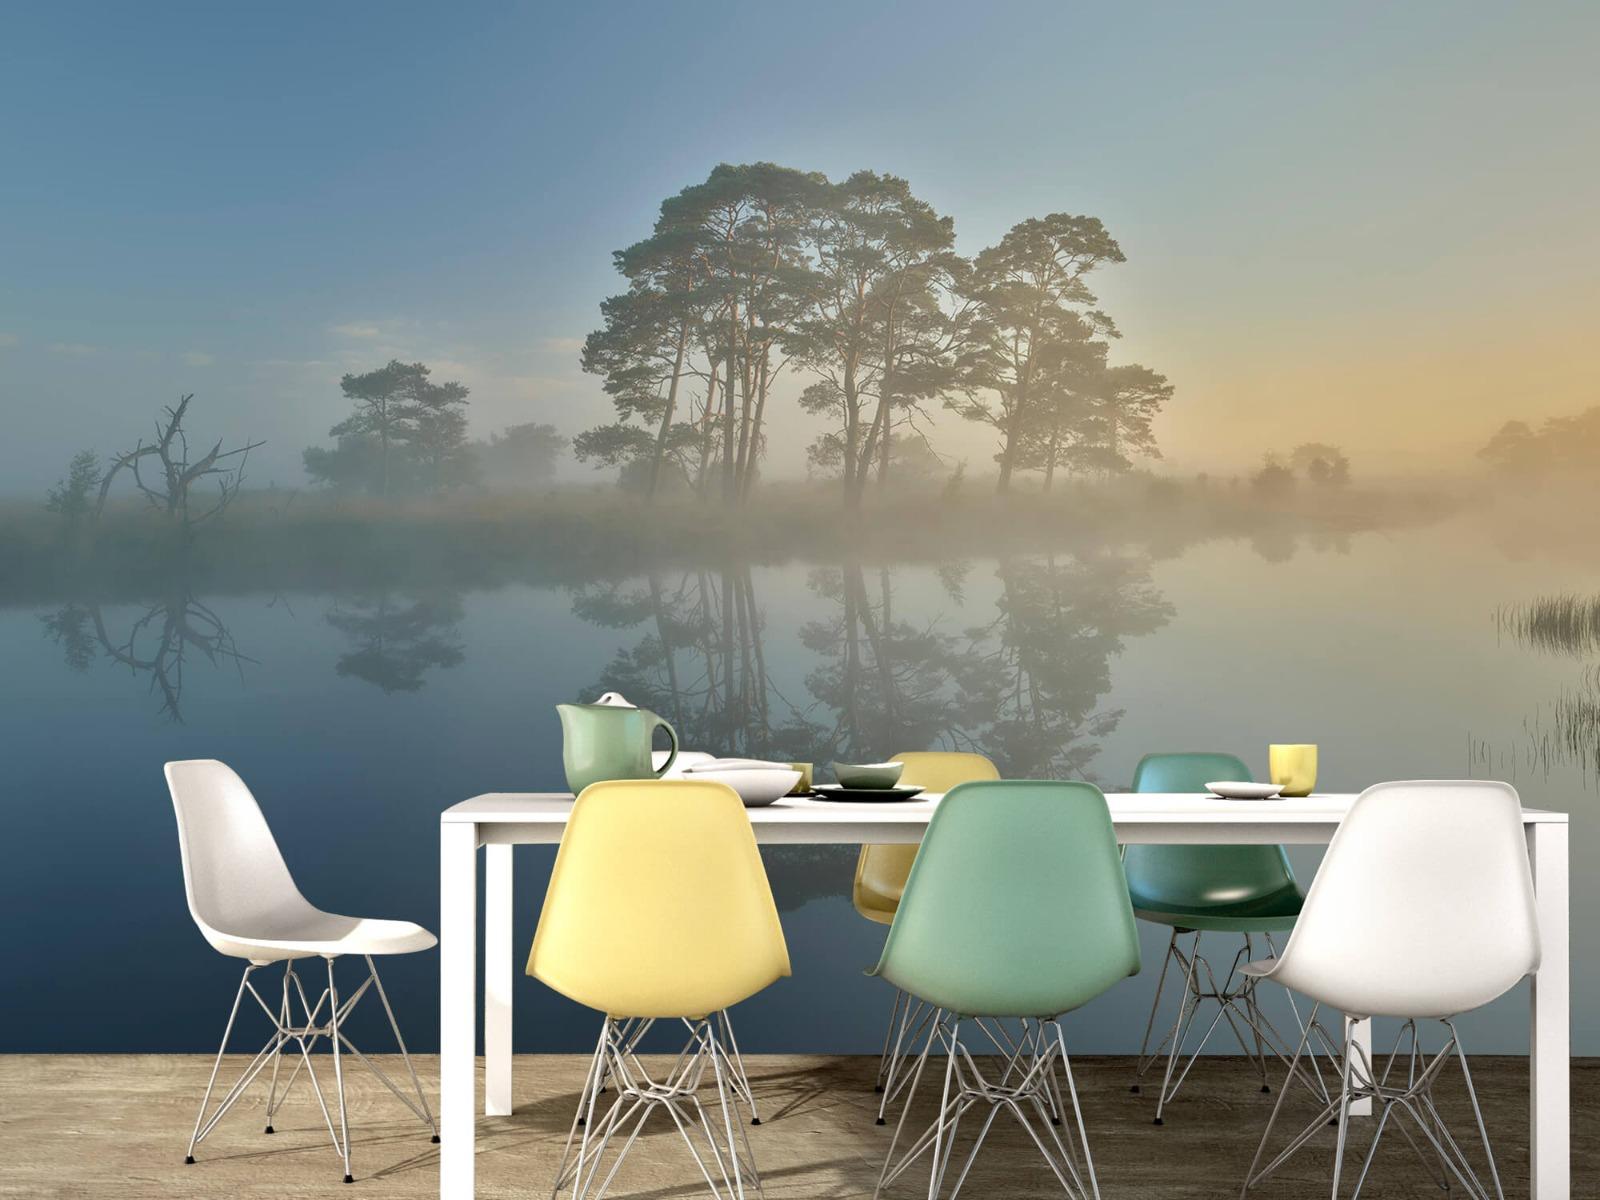 Natuur - Mist in heidegebied 15